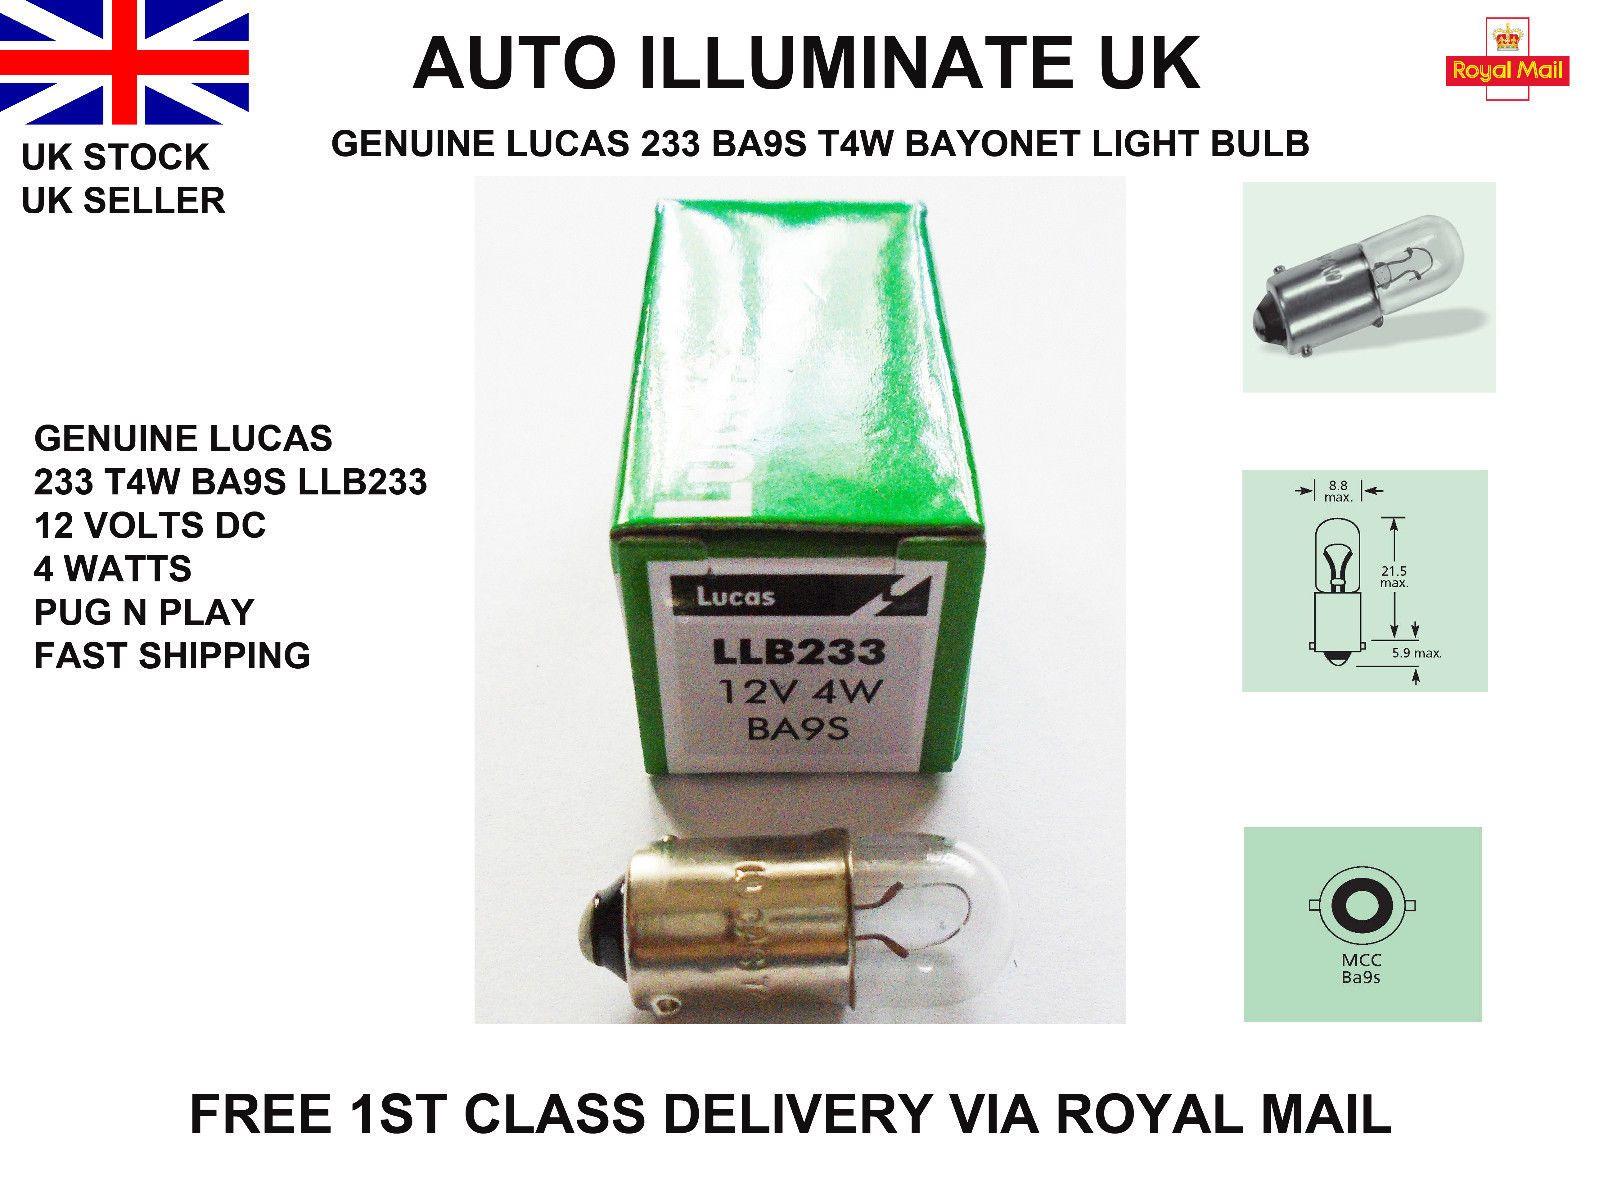 Lucas 233 Ba9s T4w Car Side Light Bulb Lamp Indicator Bayonet Llb233 Mcc 12v 4w Lighting Suppliers Light Bulb Lamp Bulb